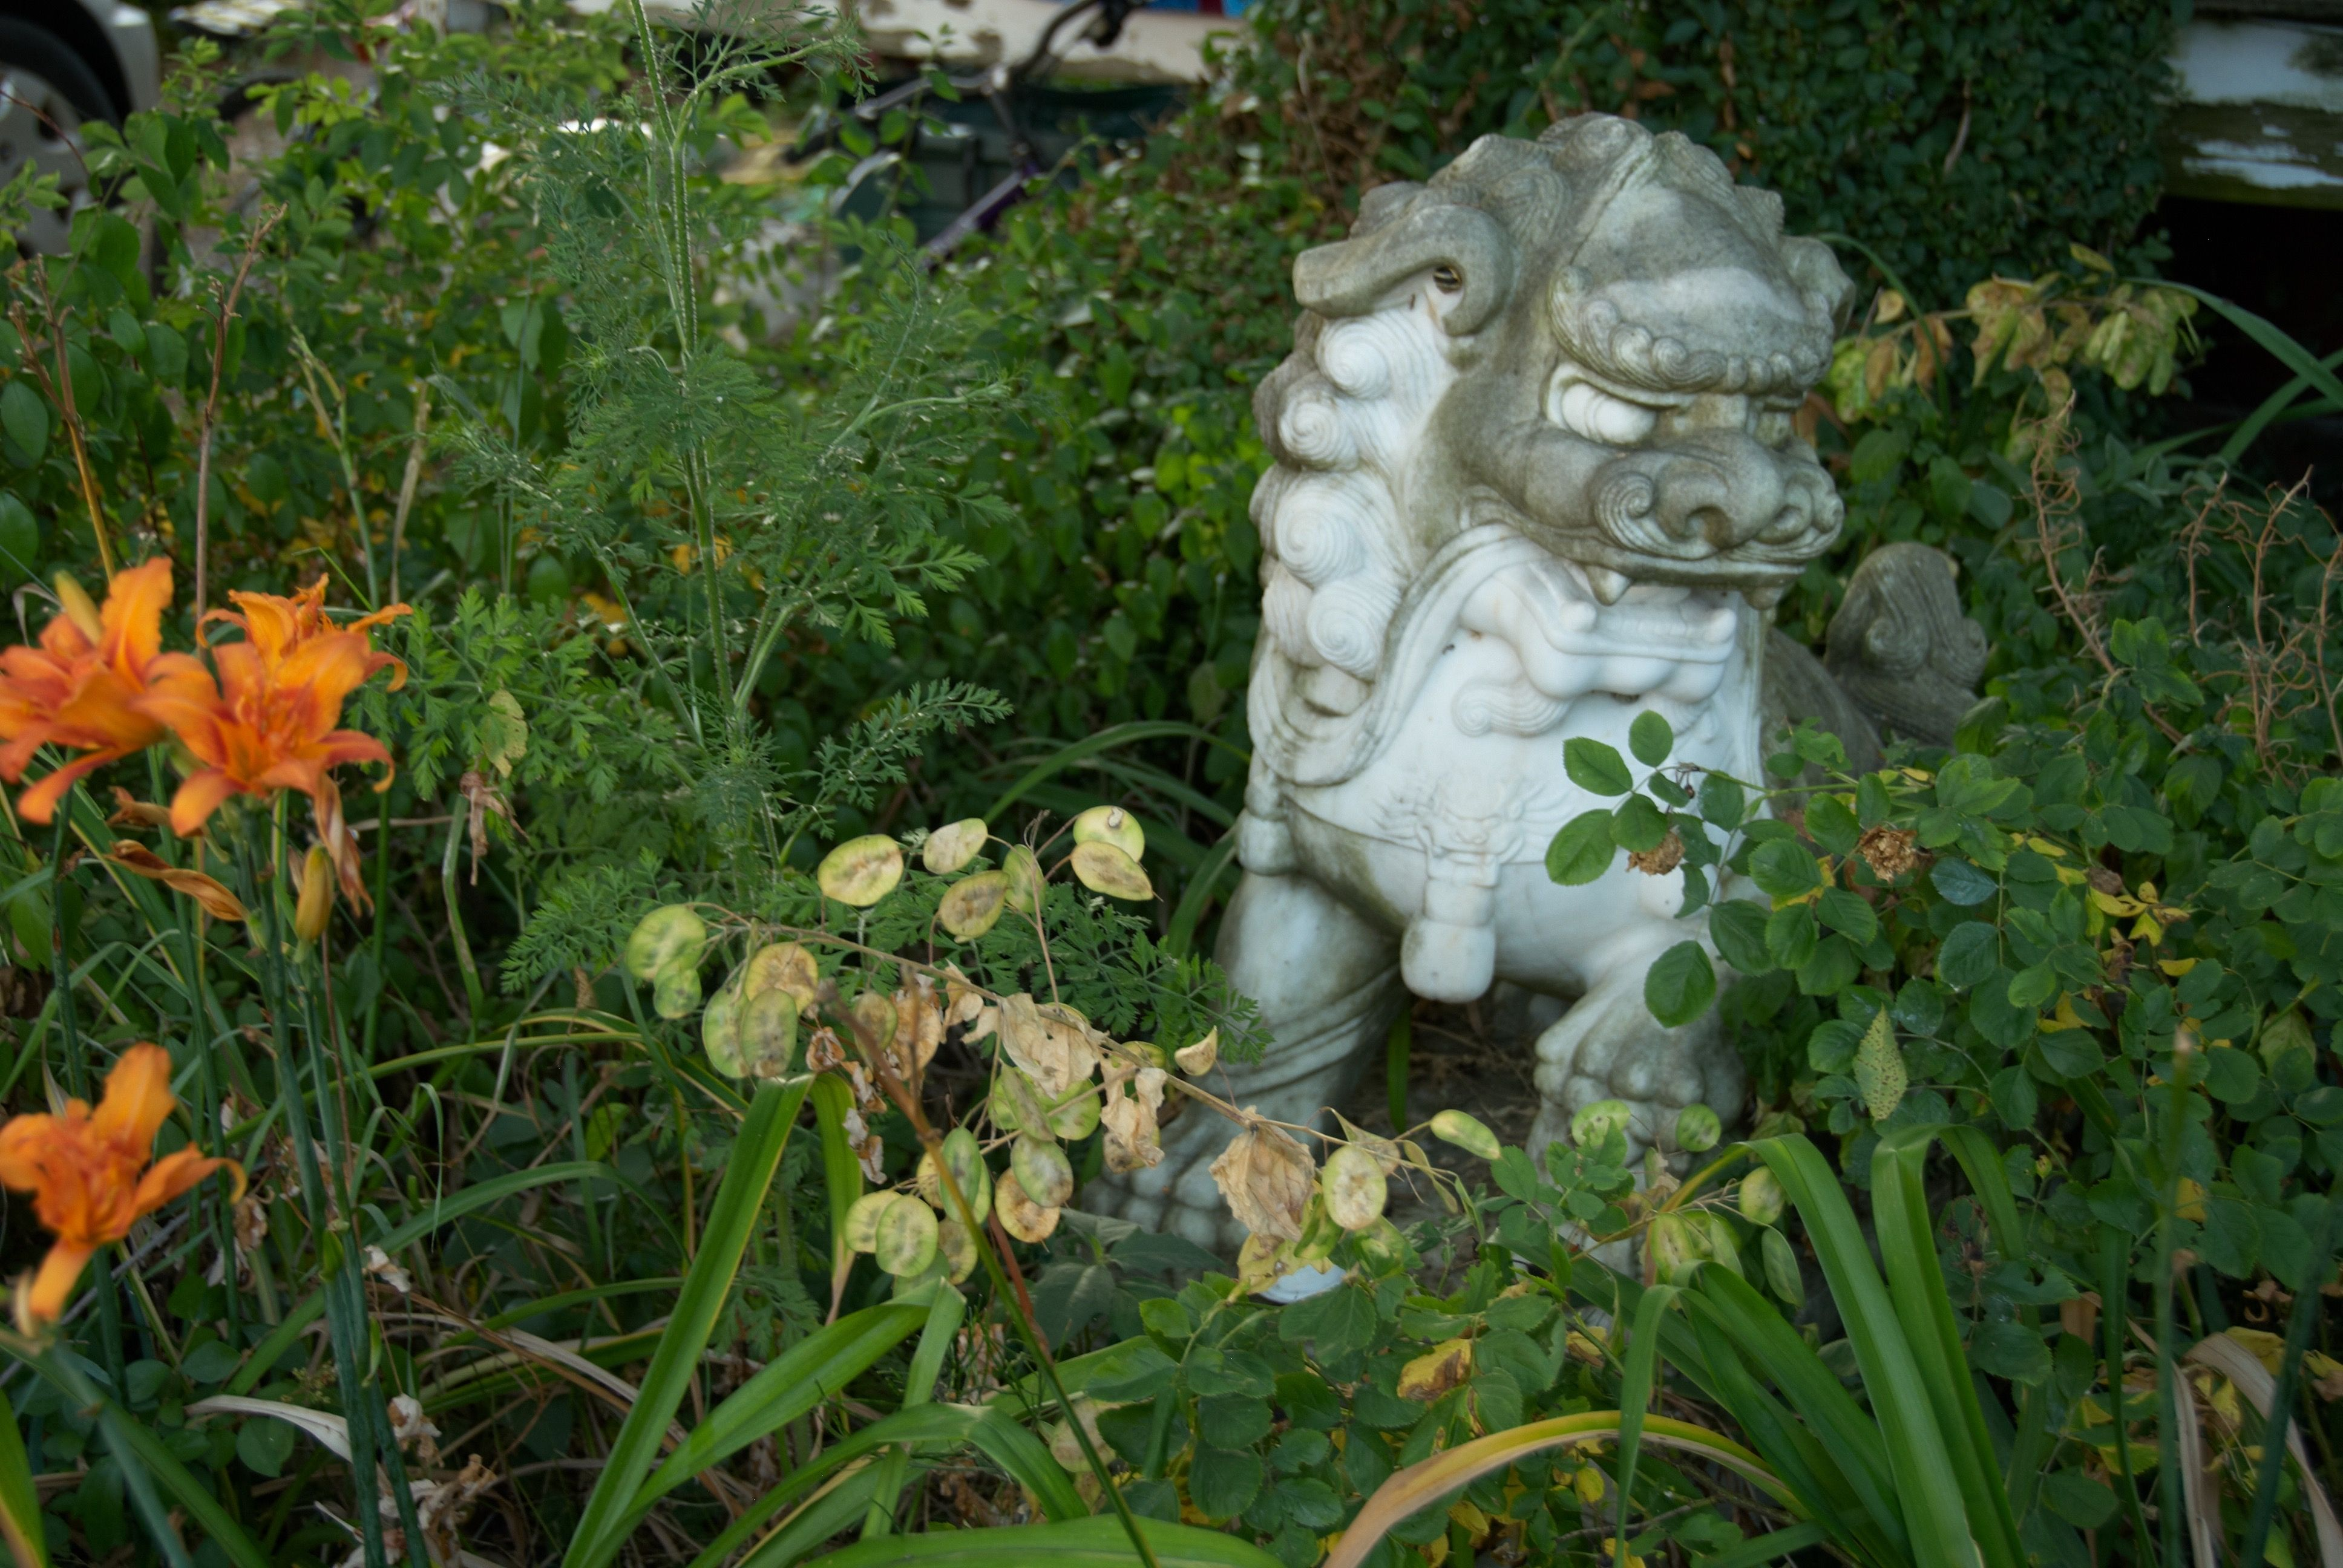 Dragon garden ornament frolicking amongst the flowers